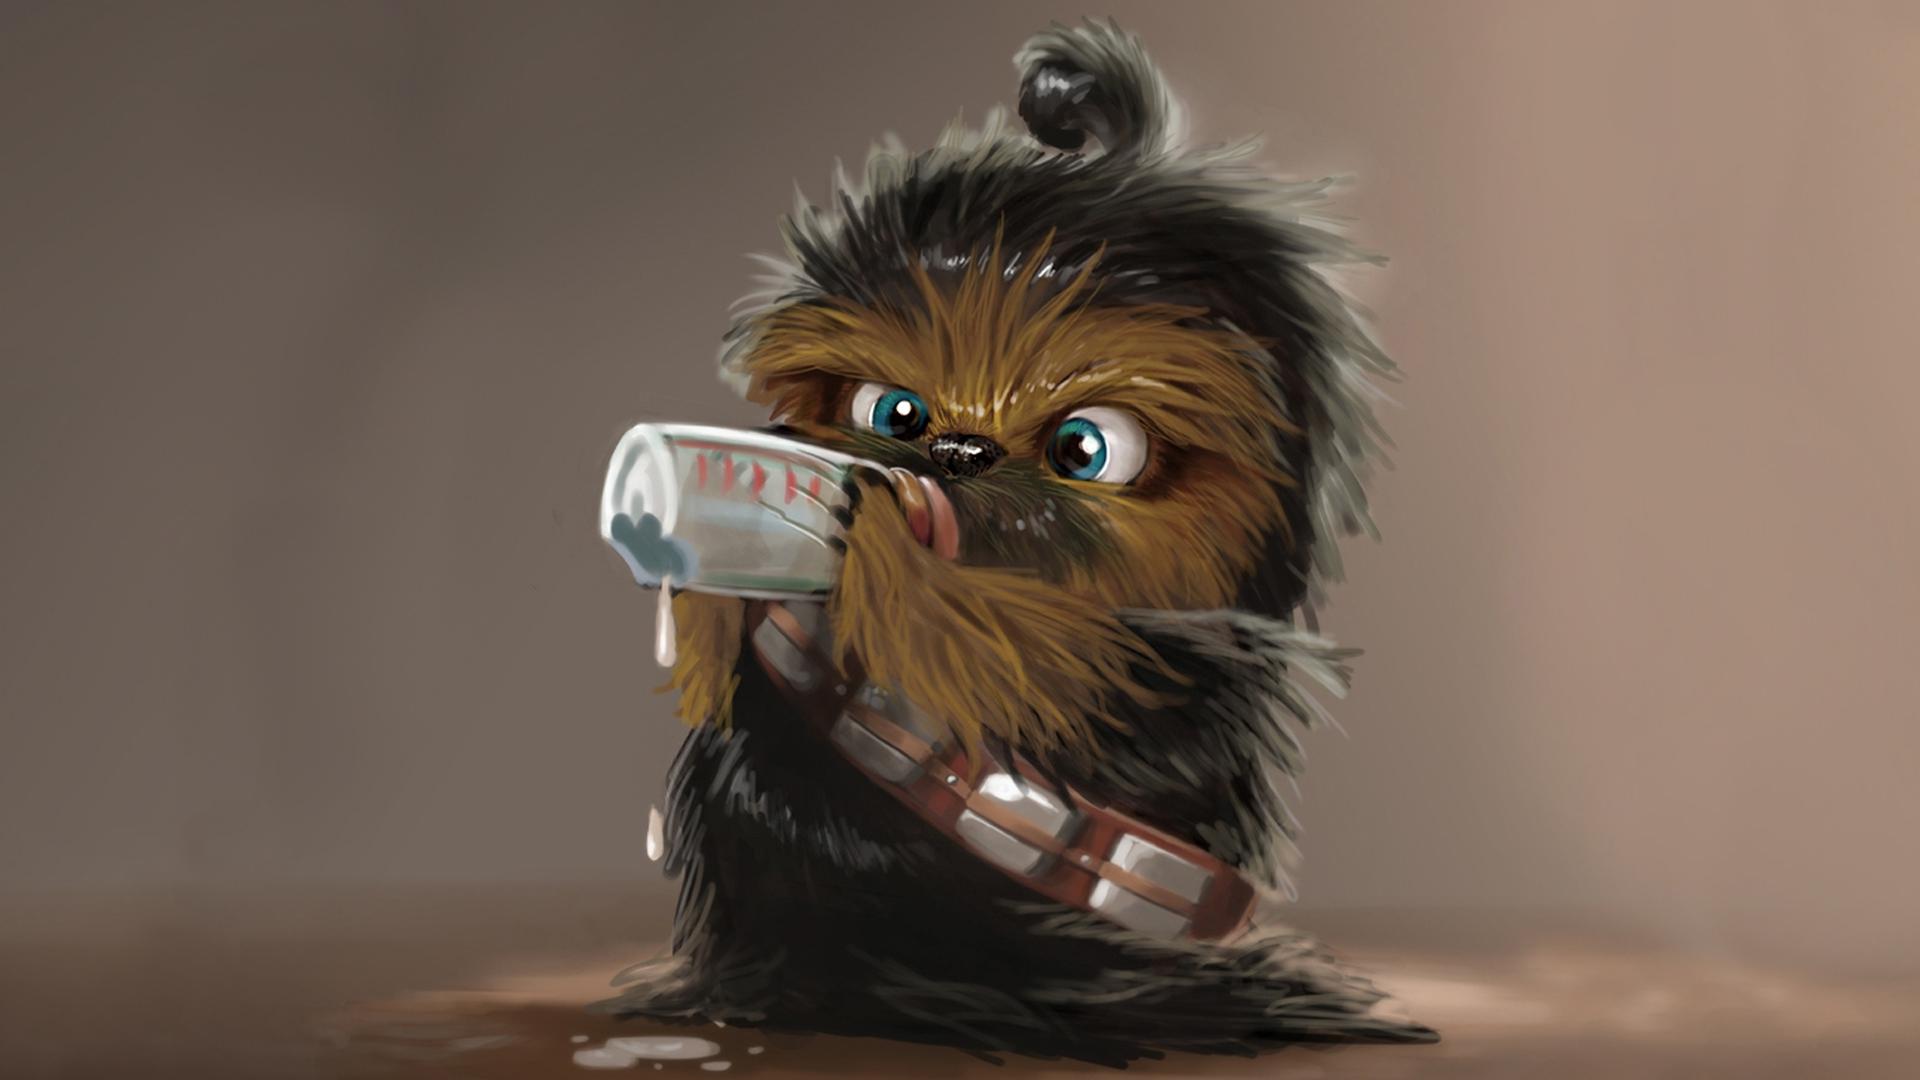 Star wars chewbacca baby Wallpapers HD 1920x1080